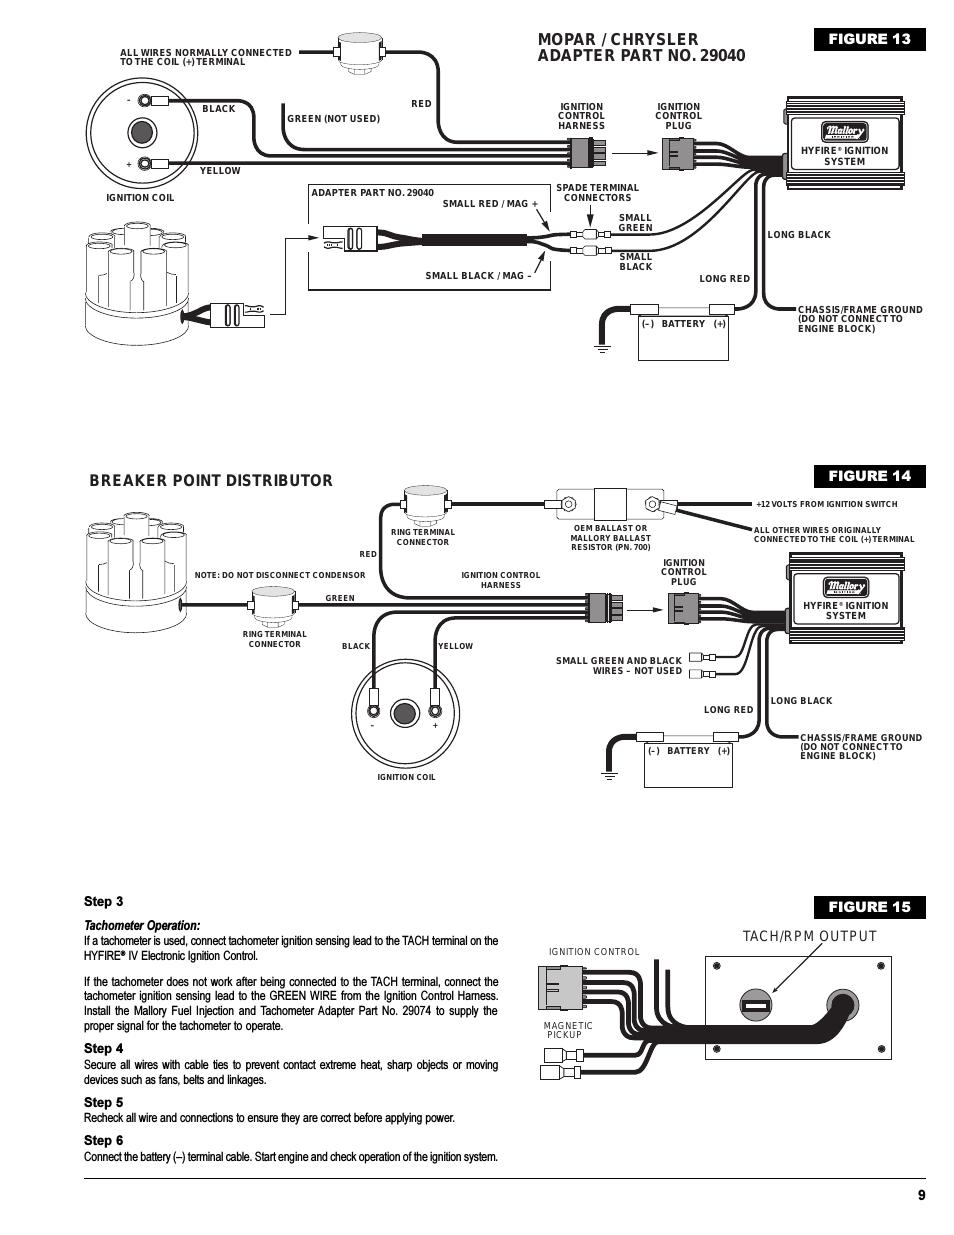 DIAGRAM] Mallory Hyfire Wiring Diagram For Cj7 FULL Version HD Quality For  Cj7 - NEMESISWIRING.DZ-ART.FRnemesiswiring.dz-art.fr